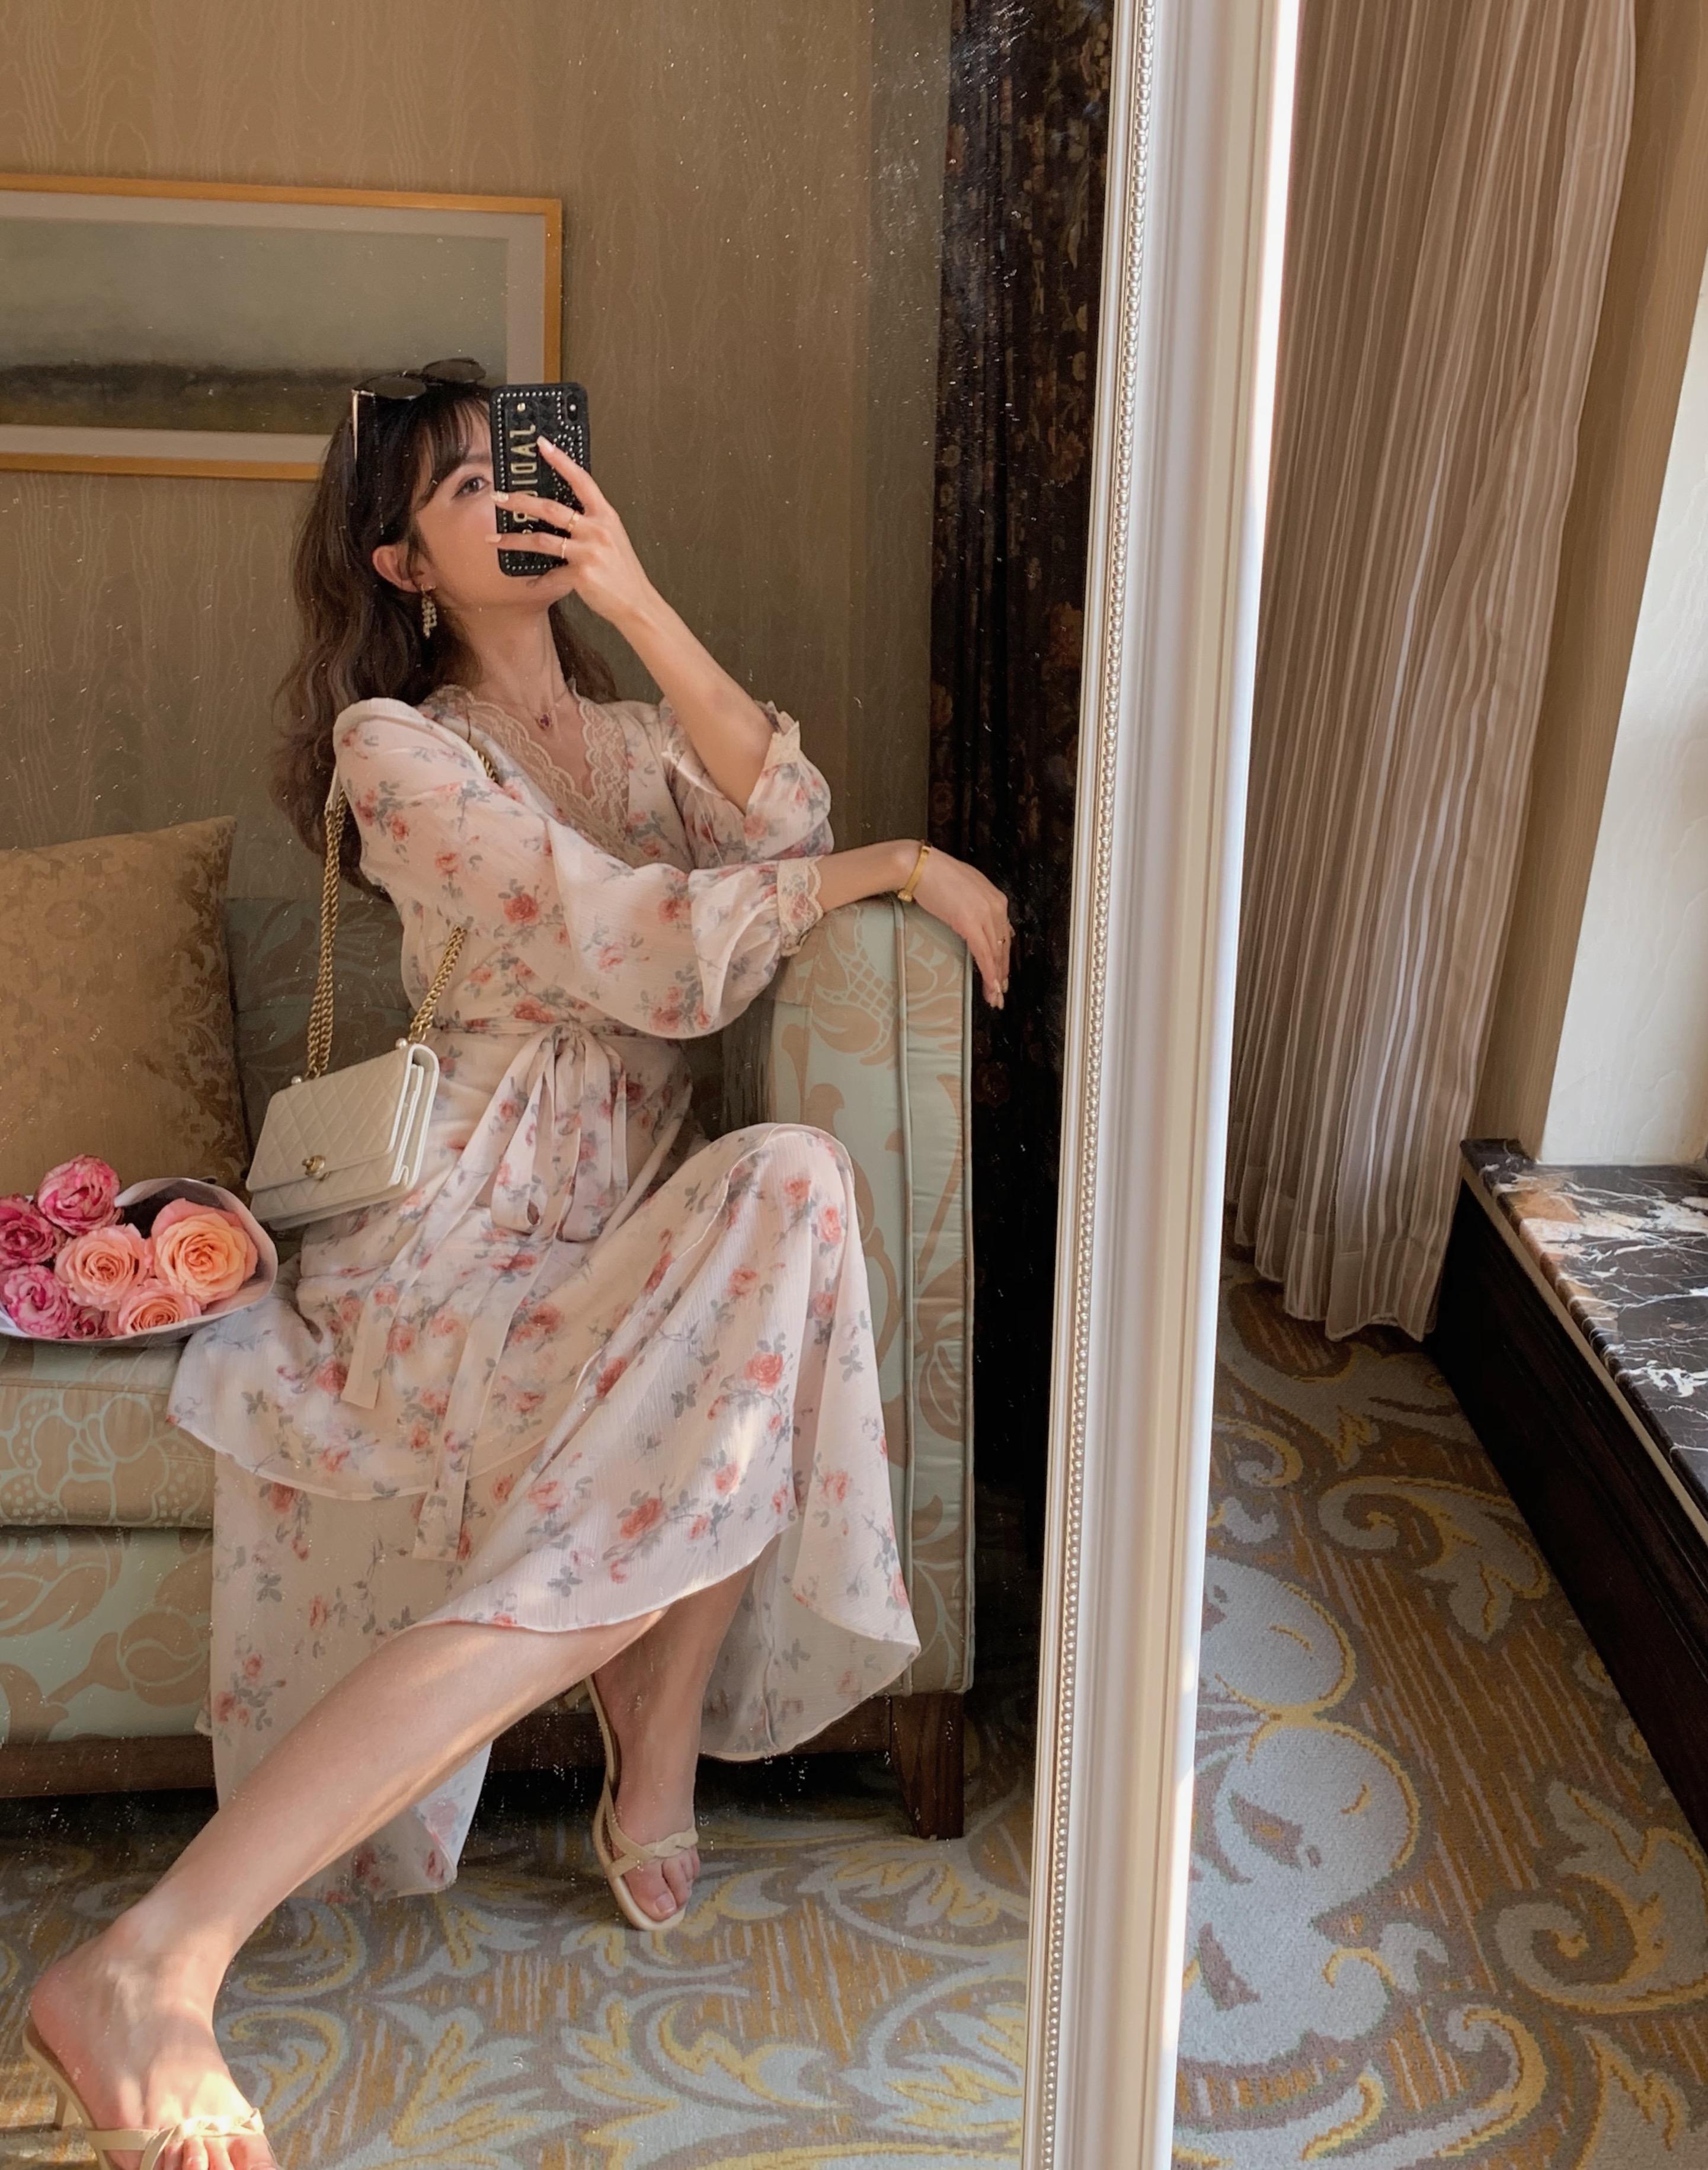 acaine 法式复古优雅碎花裙v领蕾丝花边设计抽绳收腰长袖连衣裙女图片